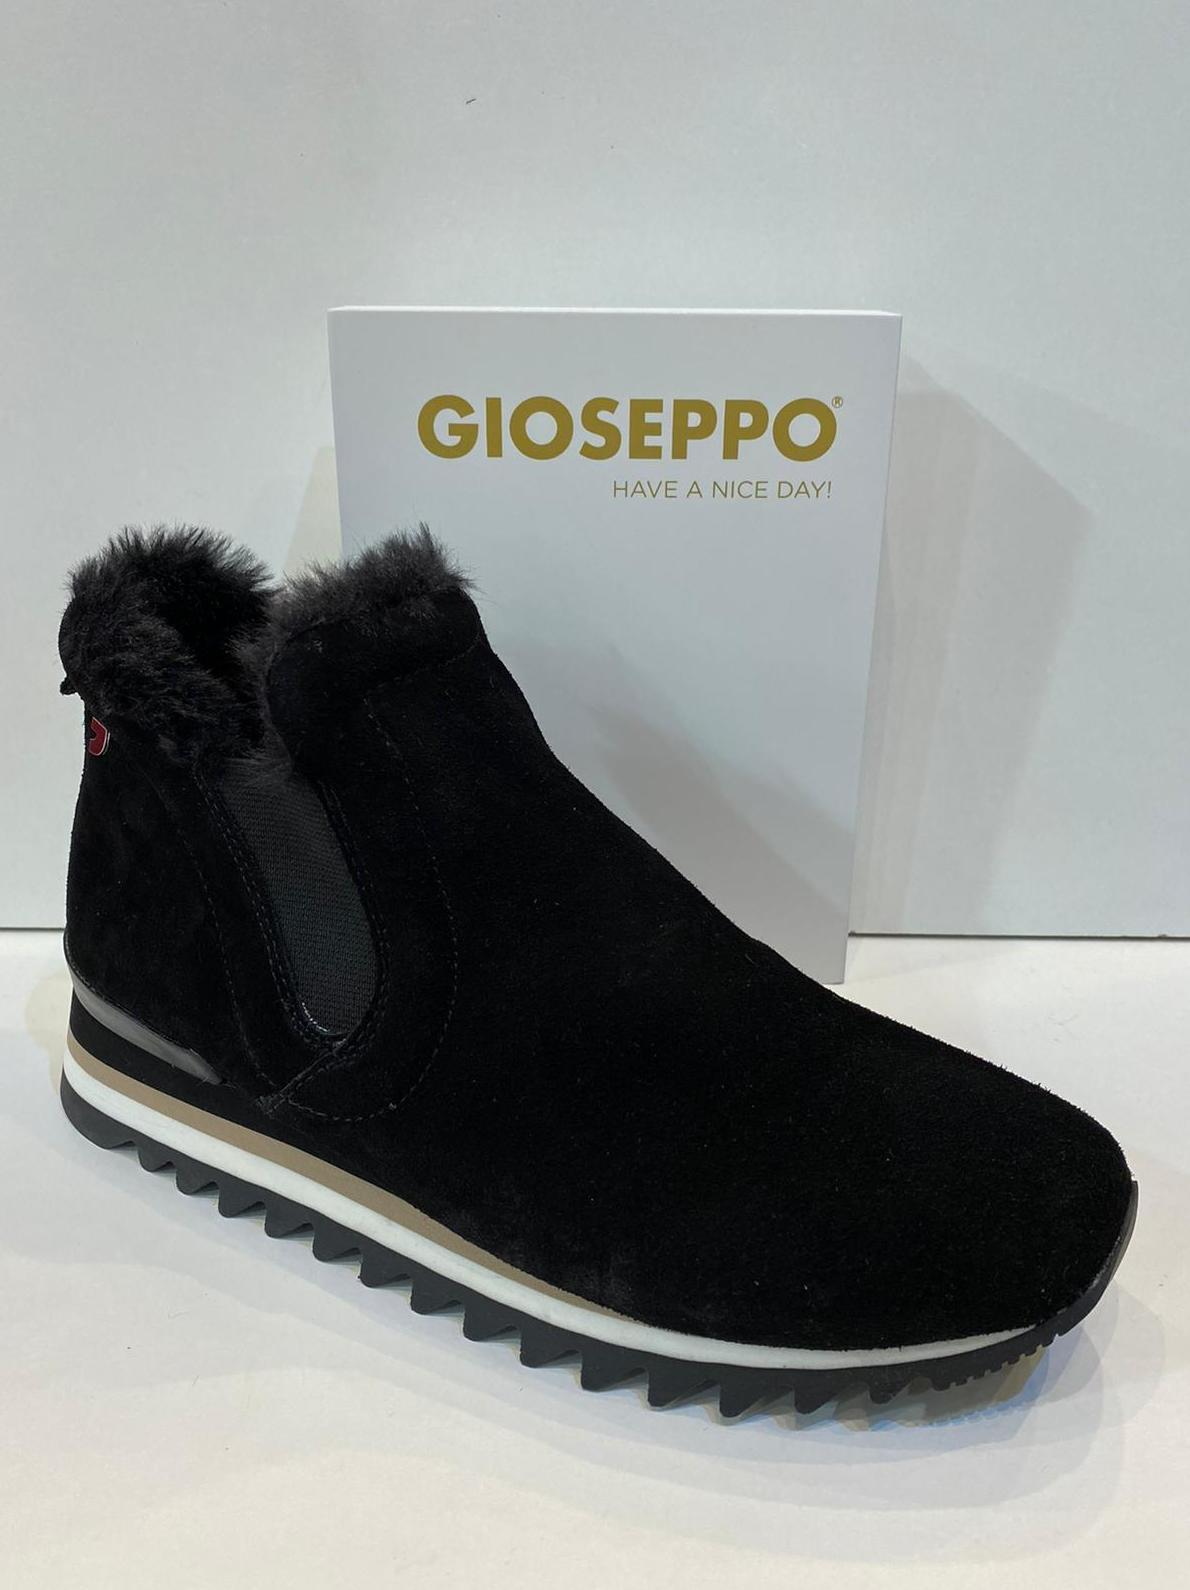 Botí de dona, de la marca Gioseppo, sense cordar 69.95€